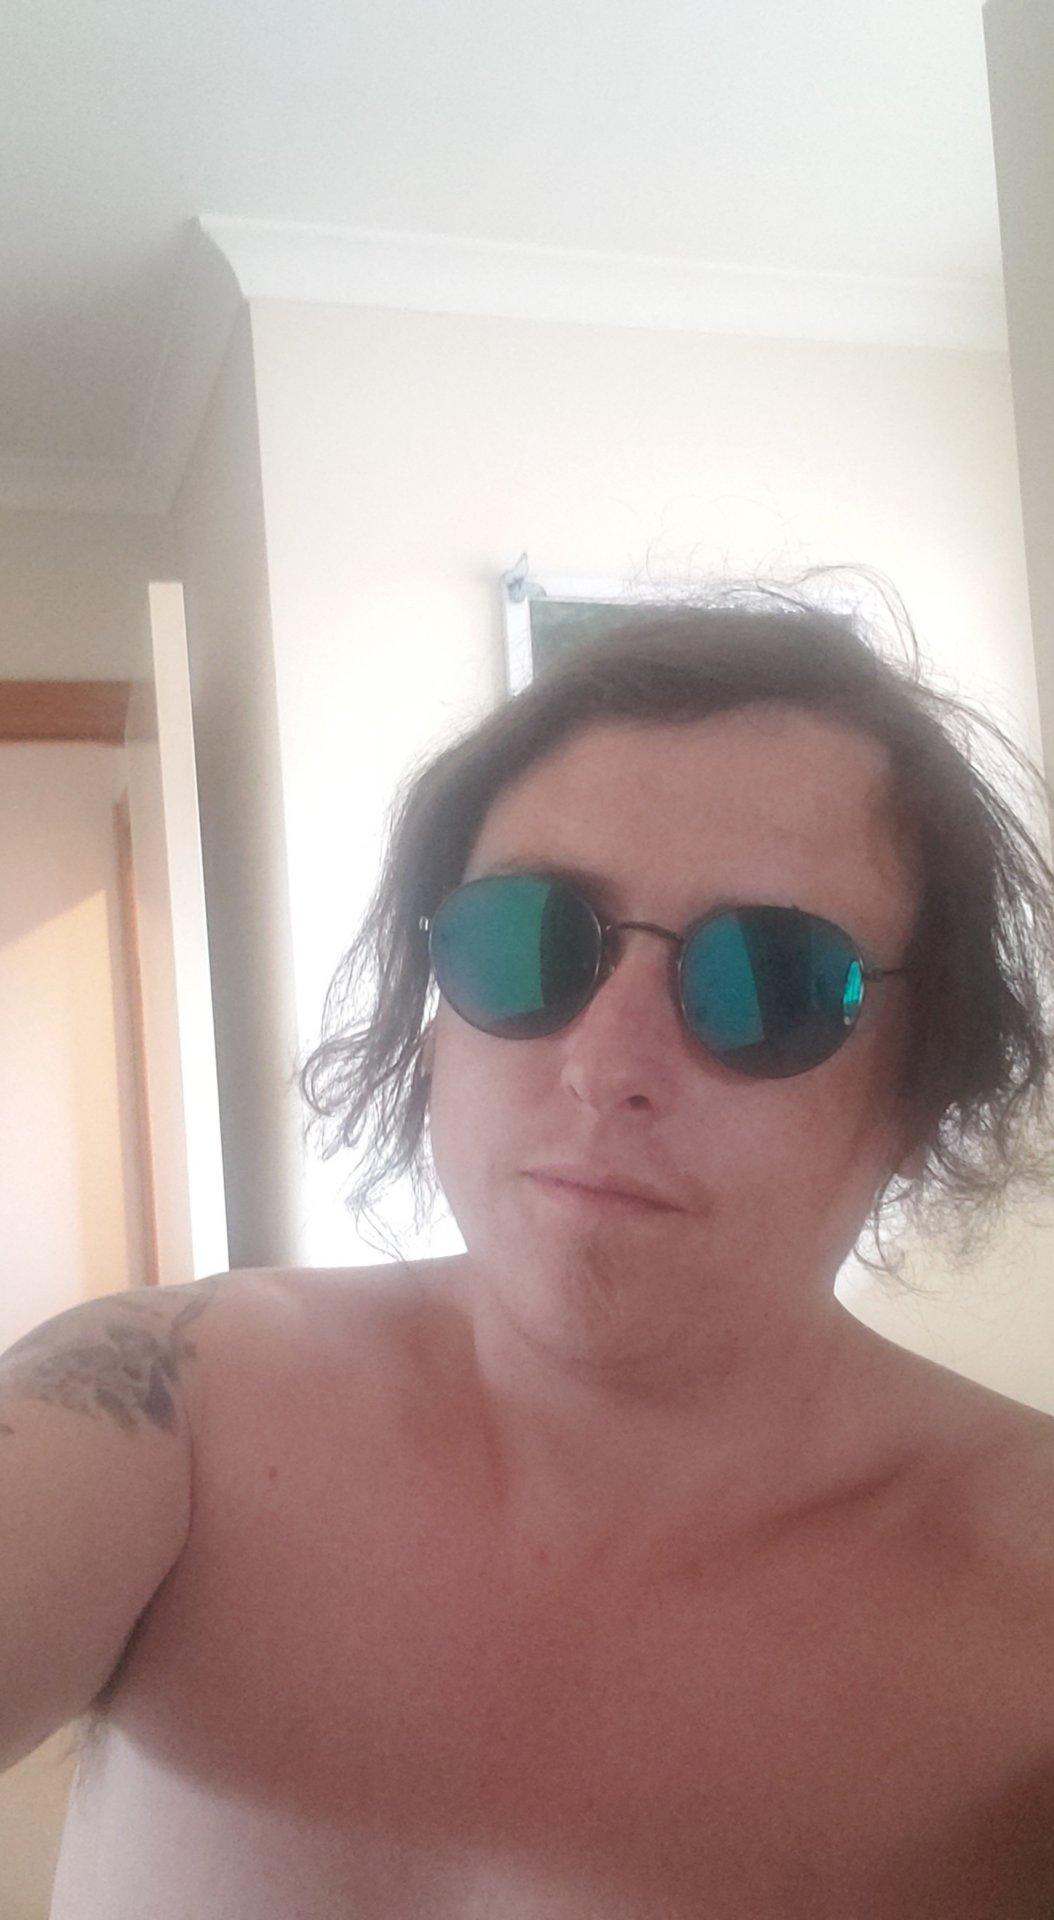 JDELPH69 from Victoria,Australia